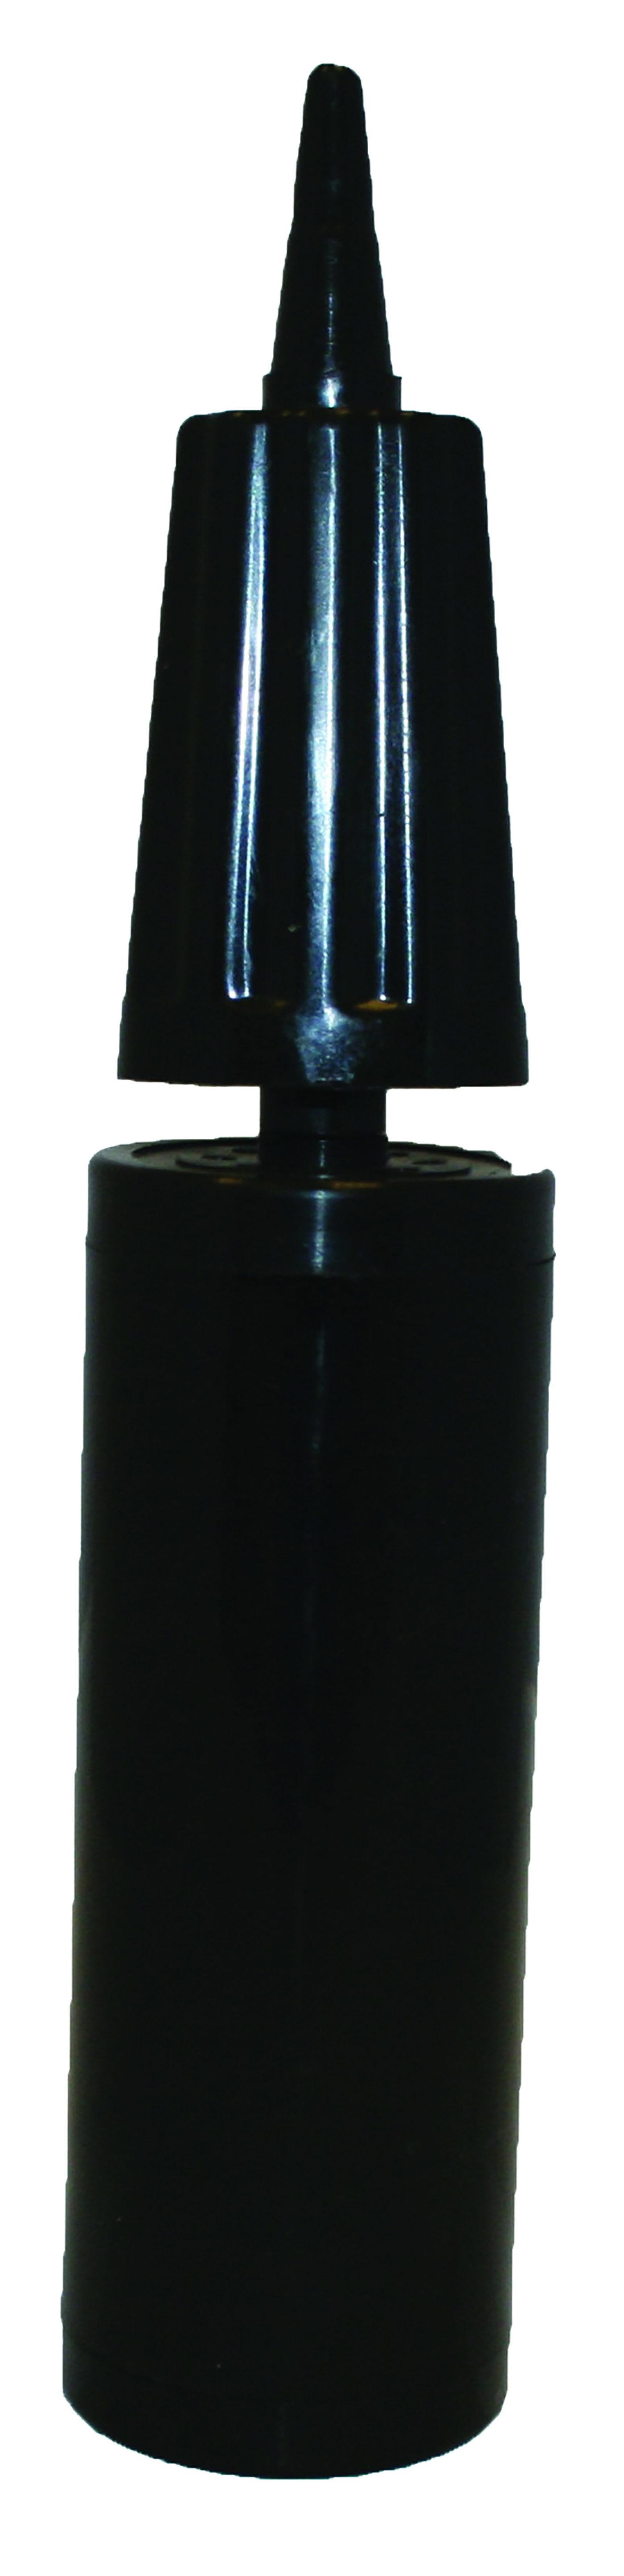 Tunturi Gymball Pomp- Fitnessbal Pomp - Yogabal Pomp